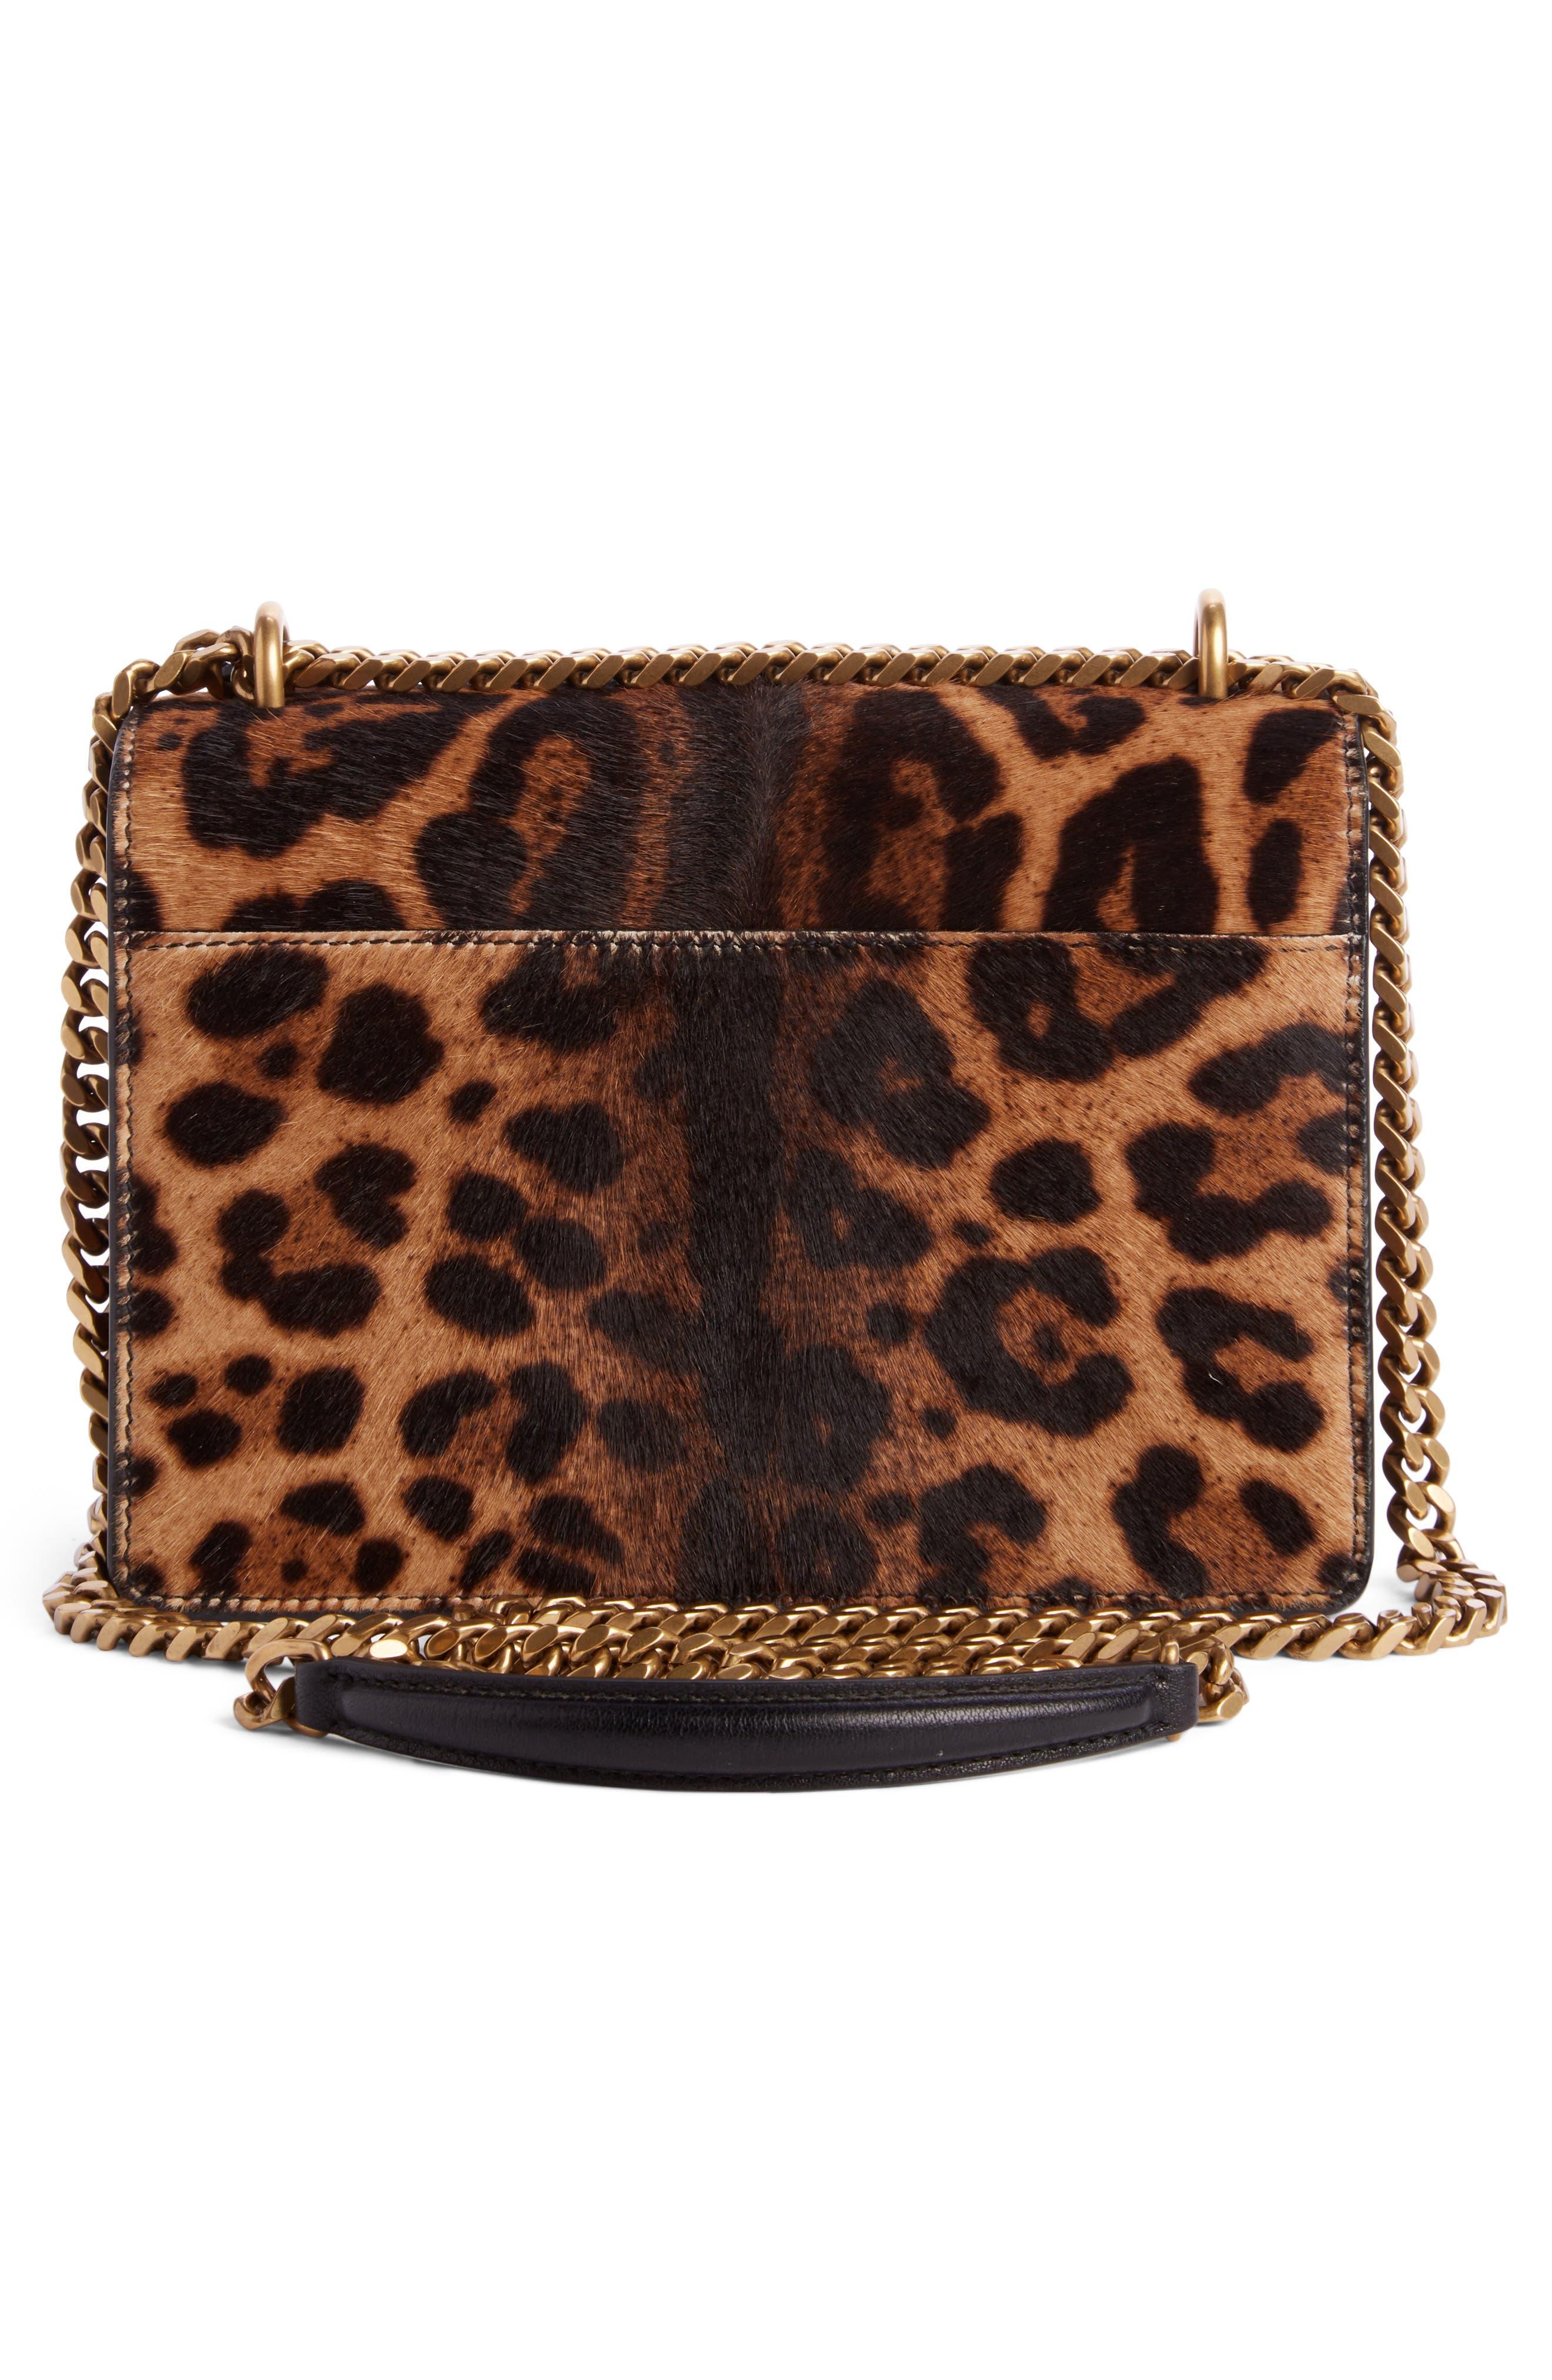 8c4fad4b8153 Calf Hair Handbags & Wallets for Women | Nordstrom